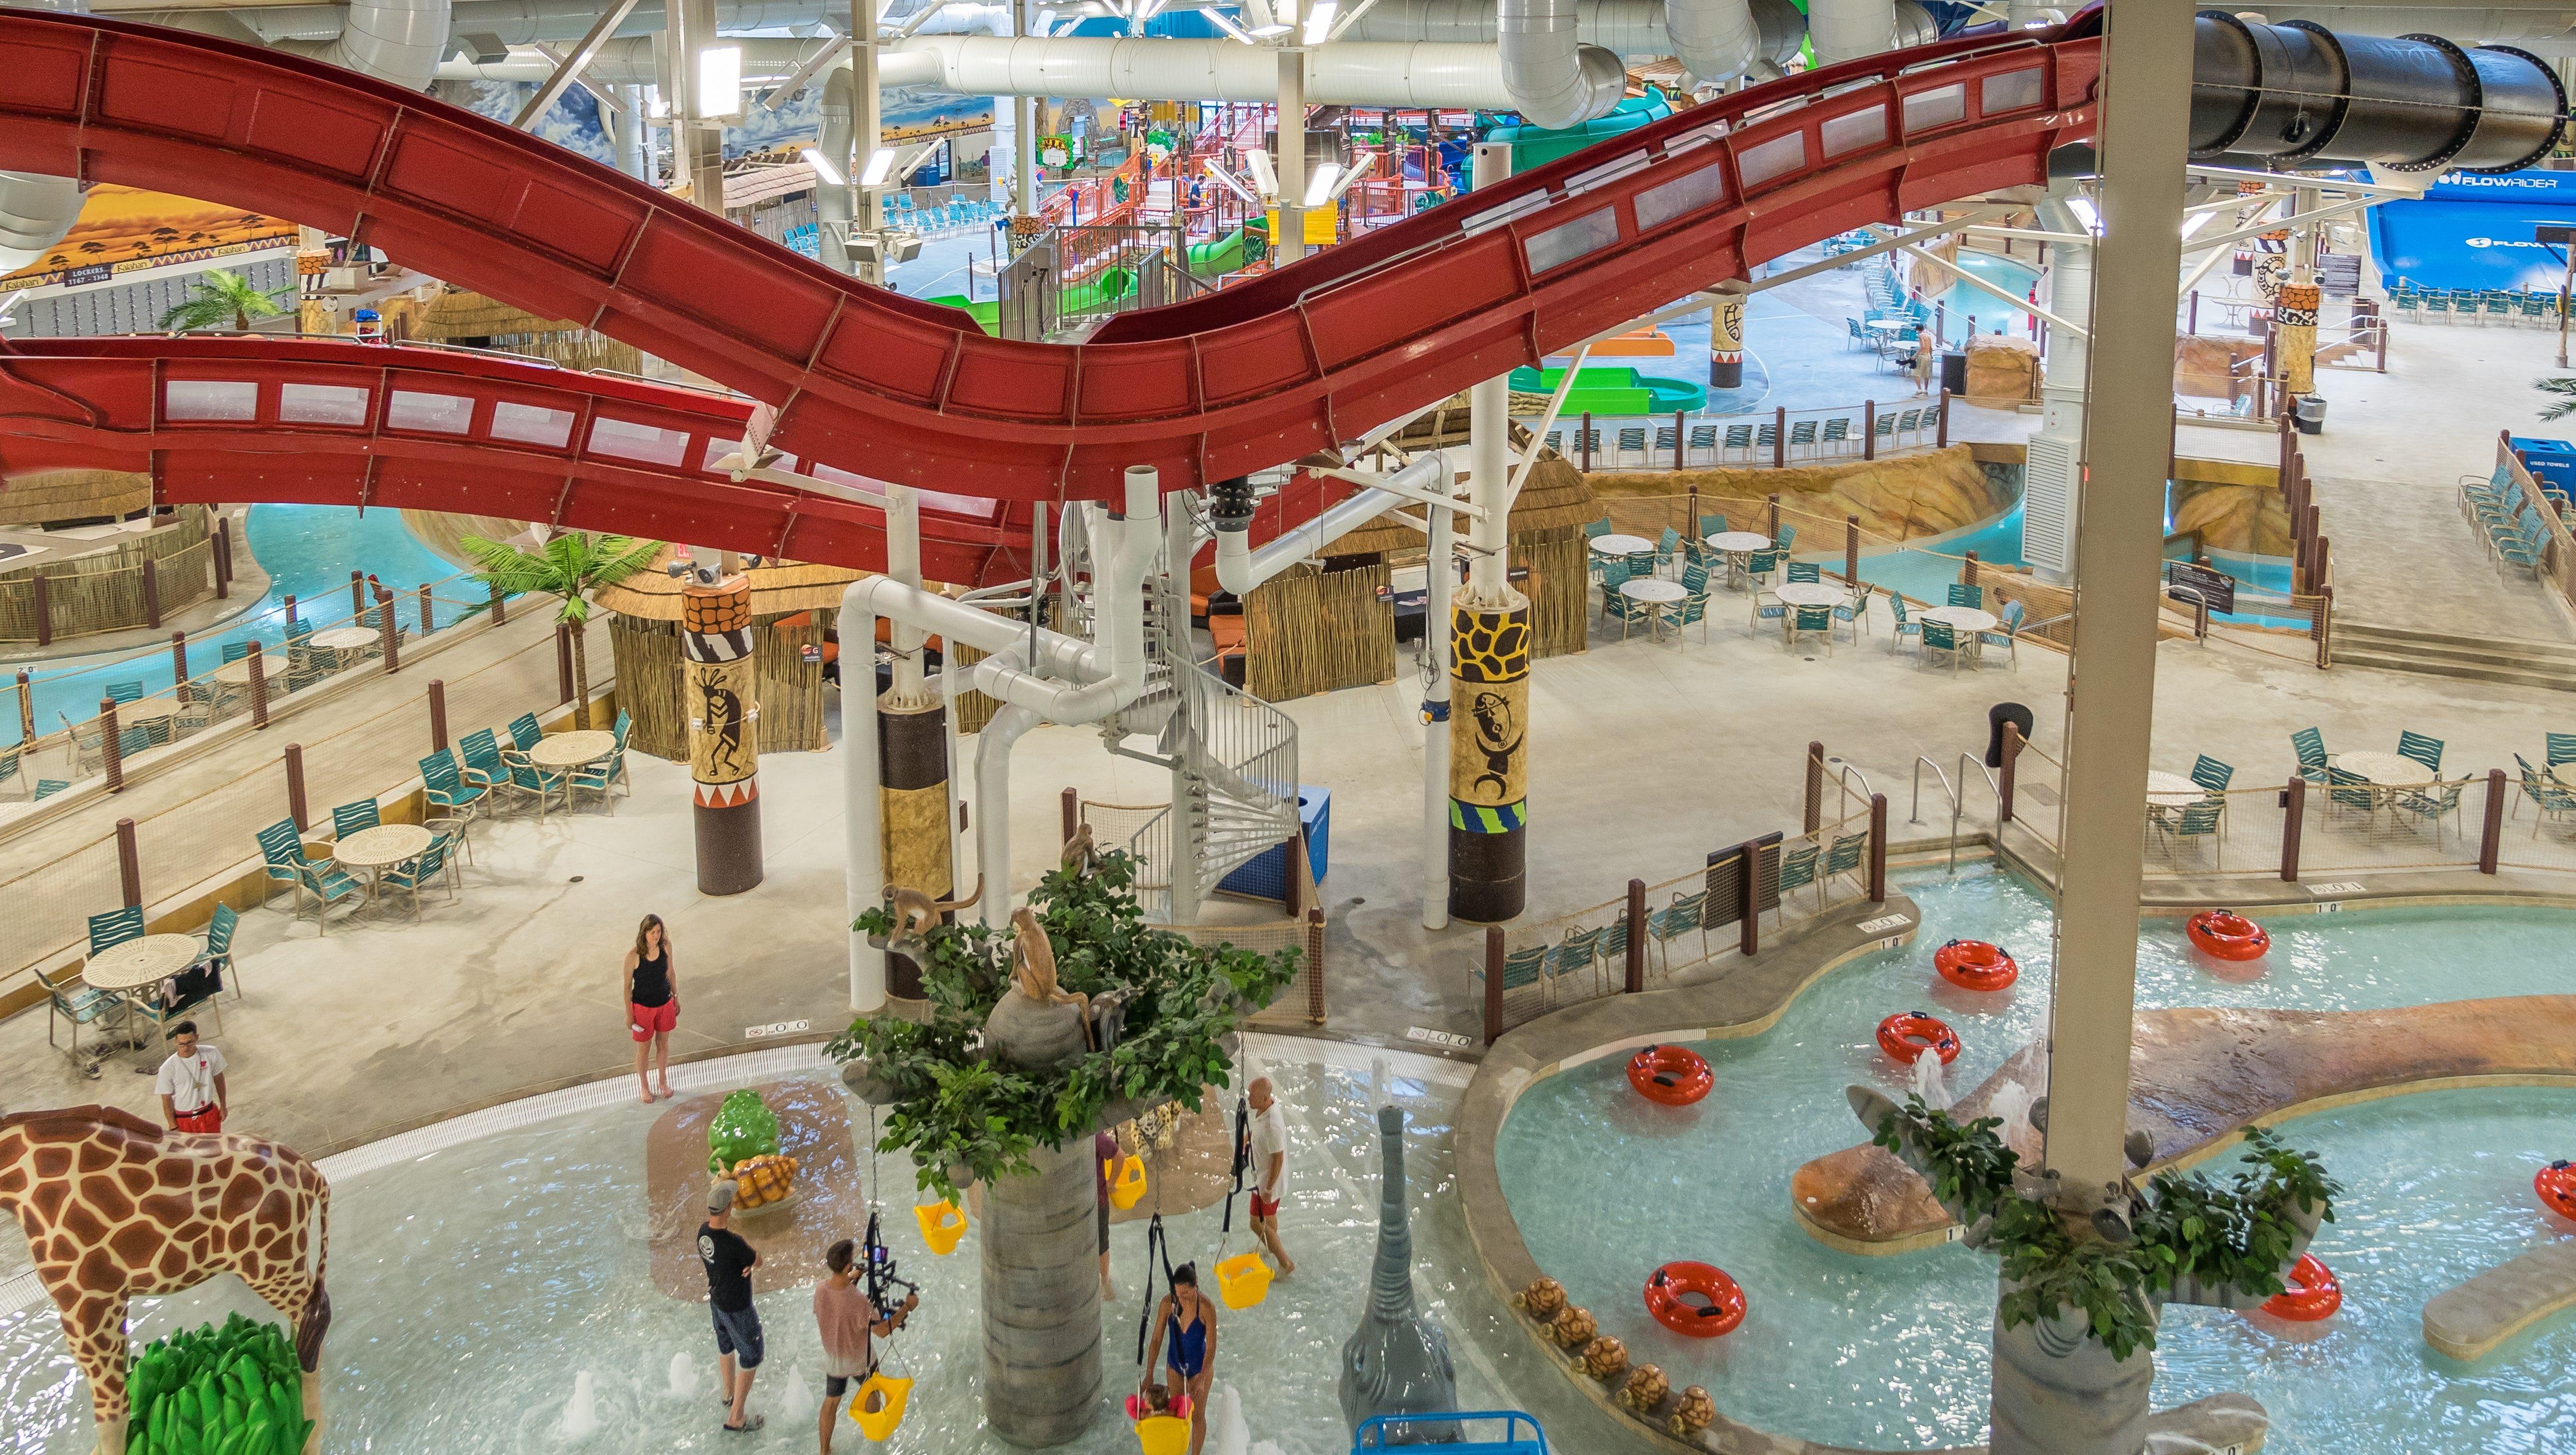 Poconos' Kalahari: America's largest indoor water park on